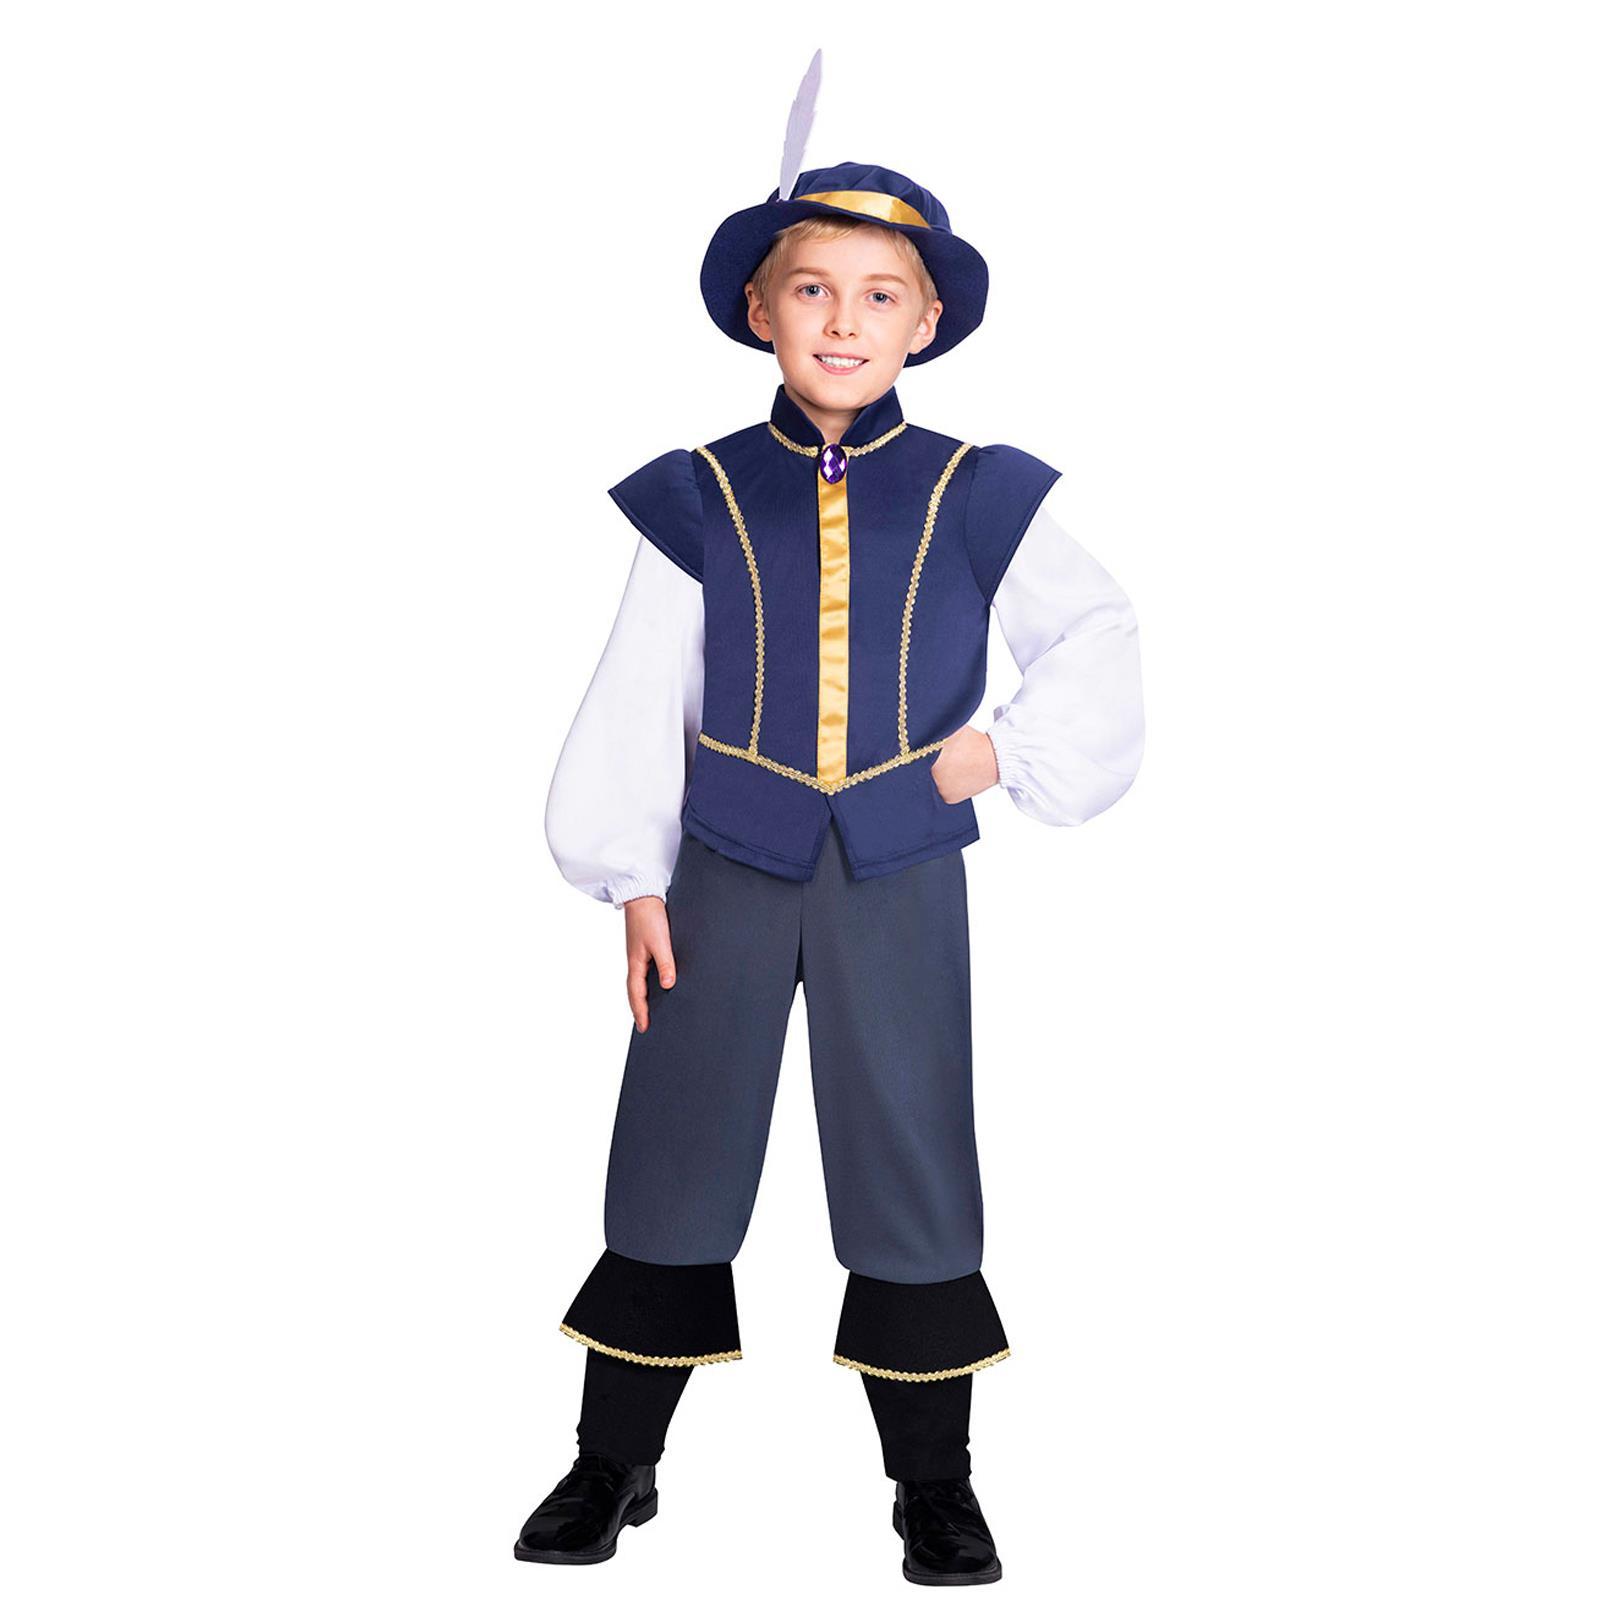 Garçons HORRIBLE HISTORIES Henry VIII 8th Costume Déguisement Livre Médiéval Tudor